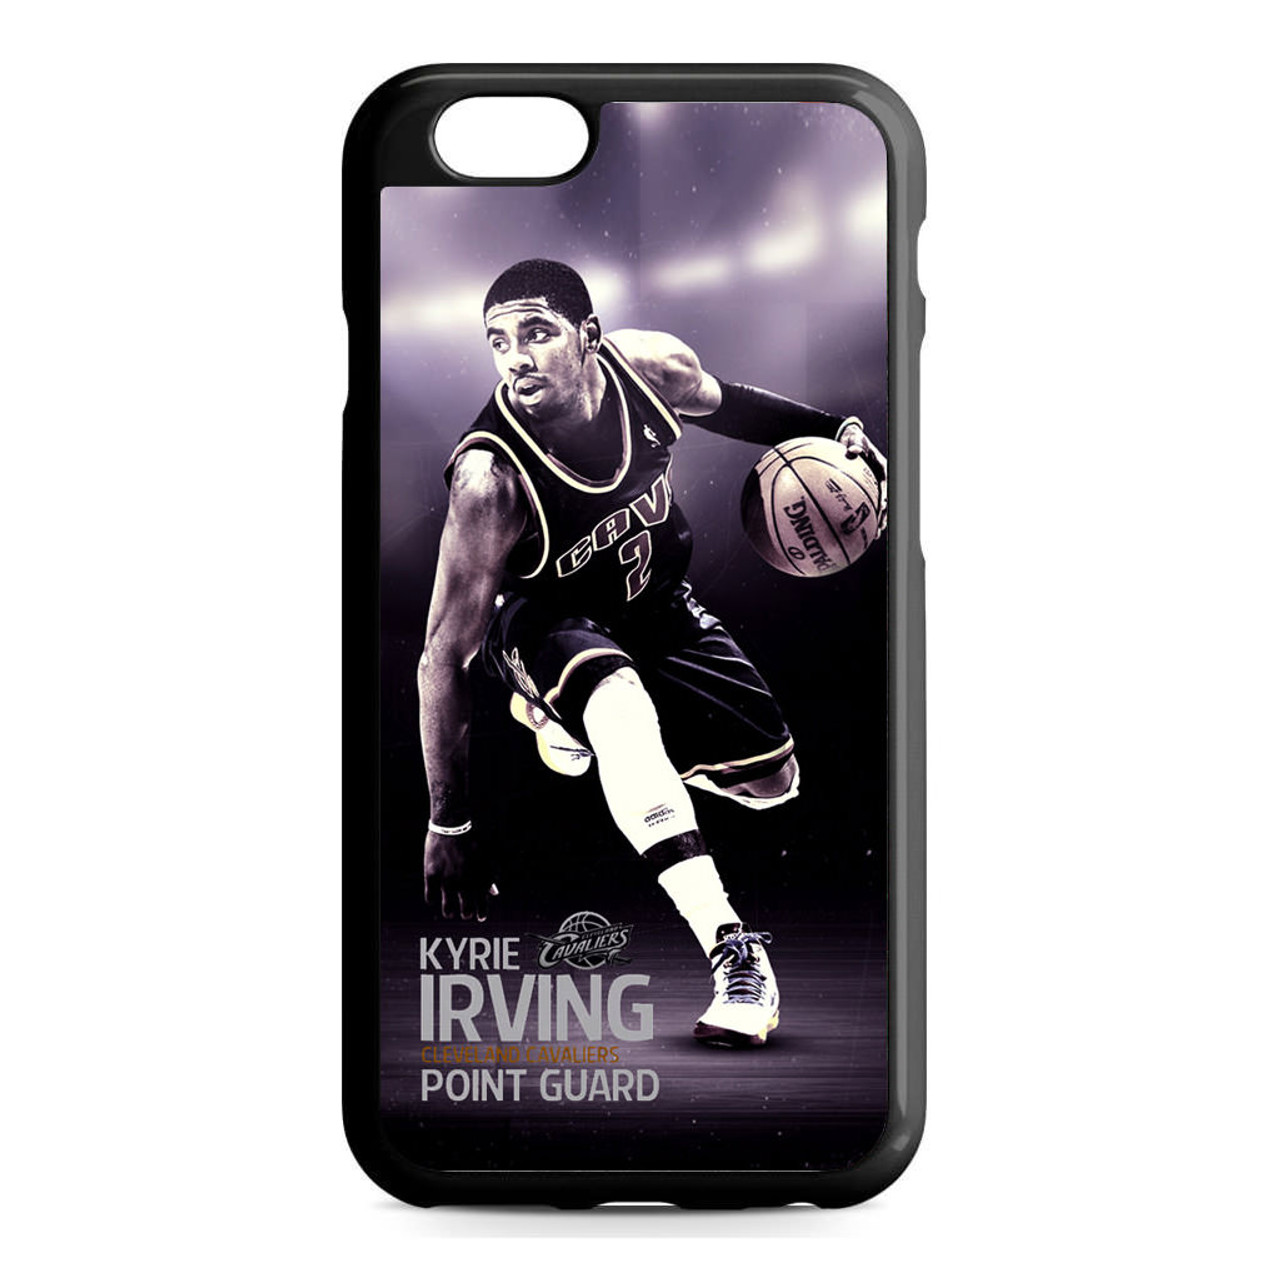 wholesale dealer 6433b e23ca Cleveland Cavaliers Kyrie Irving iPhone 6/6S Case